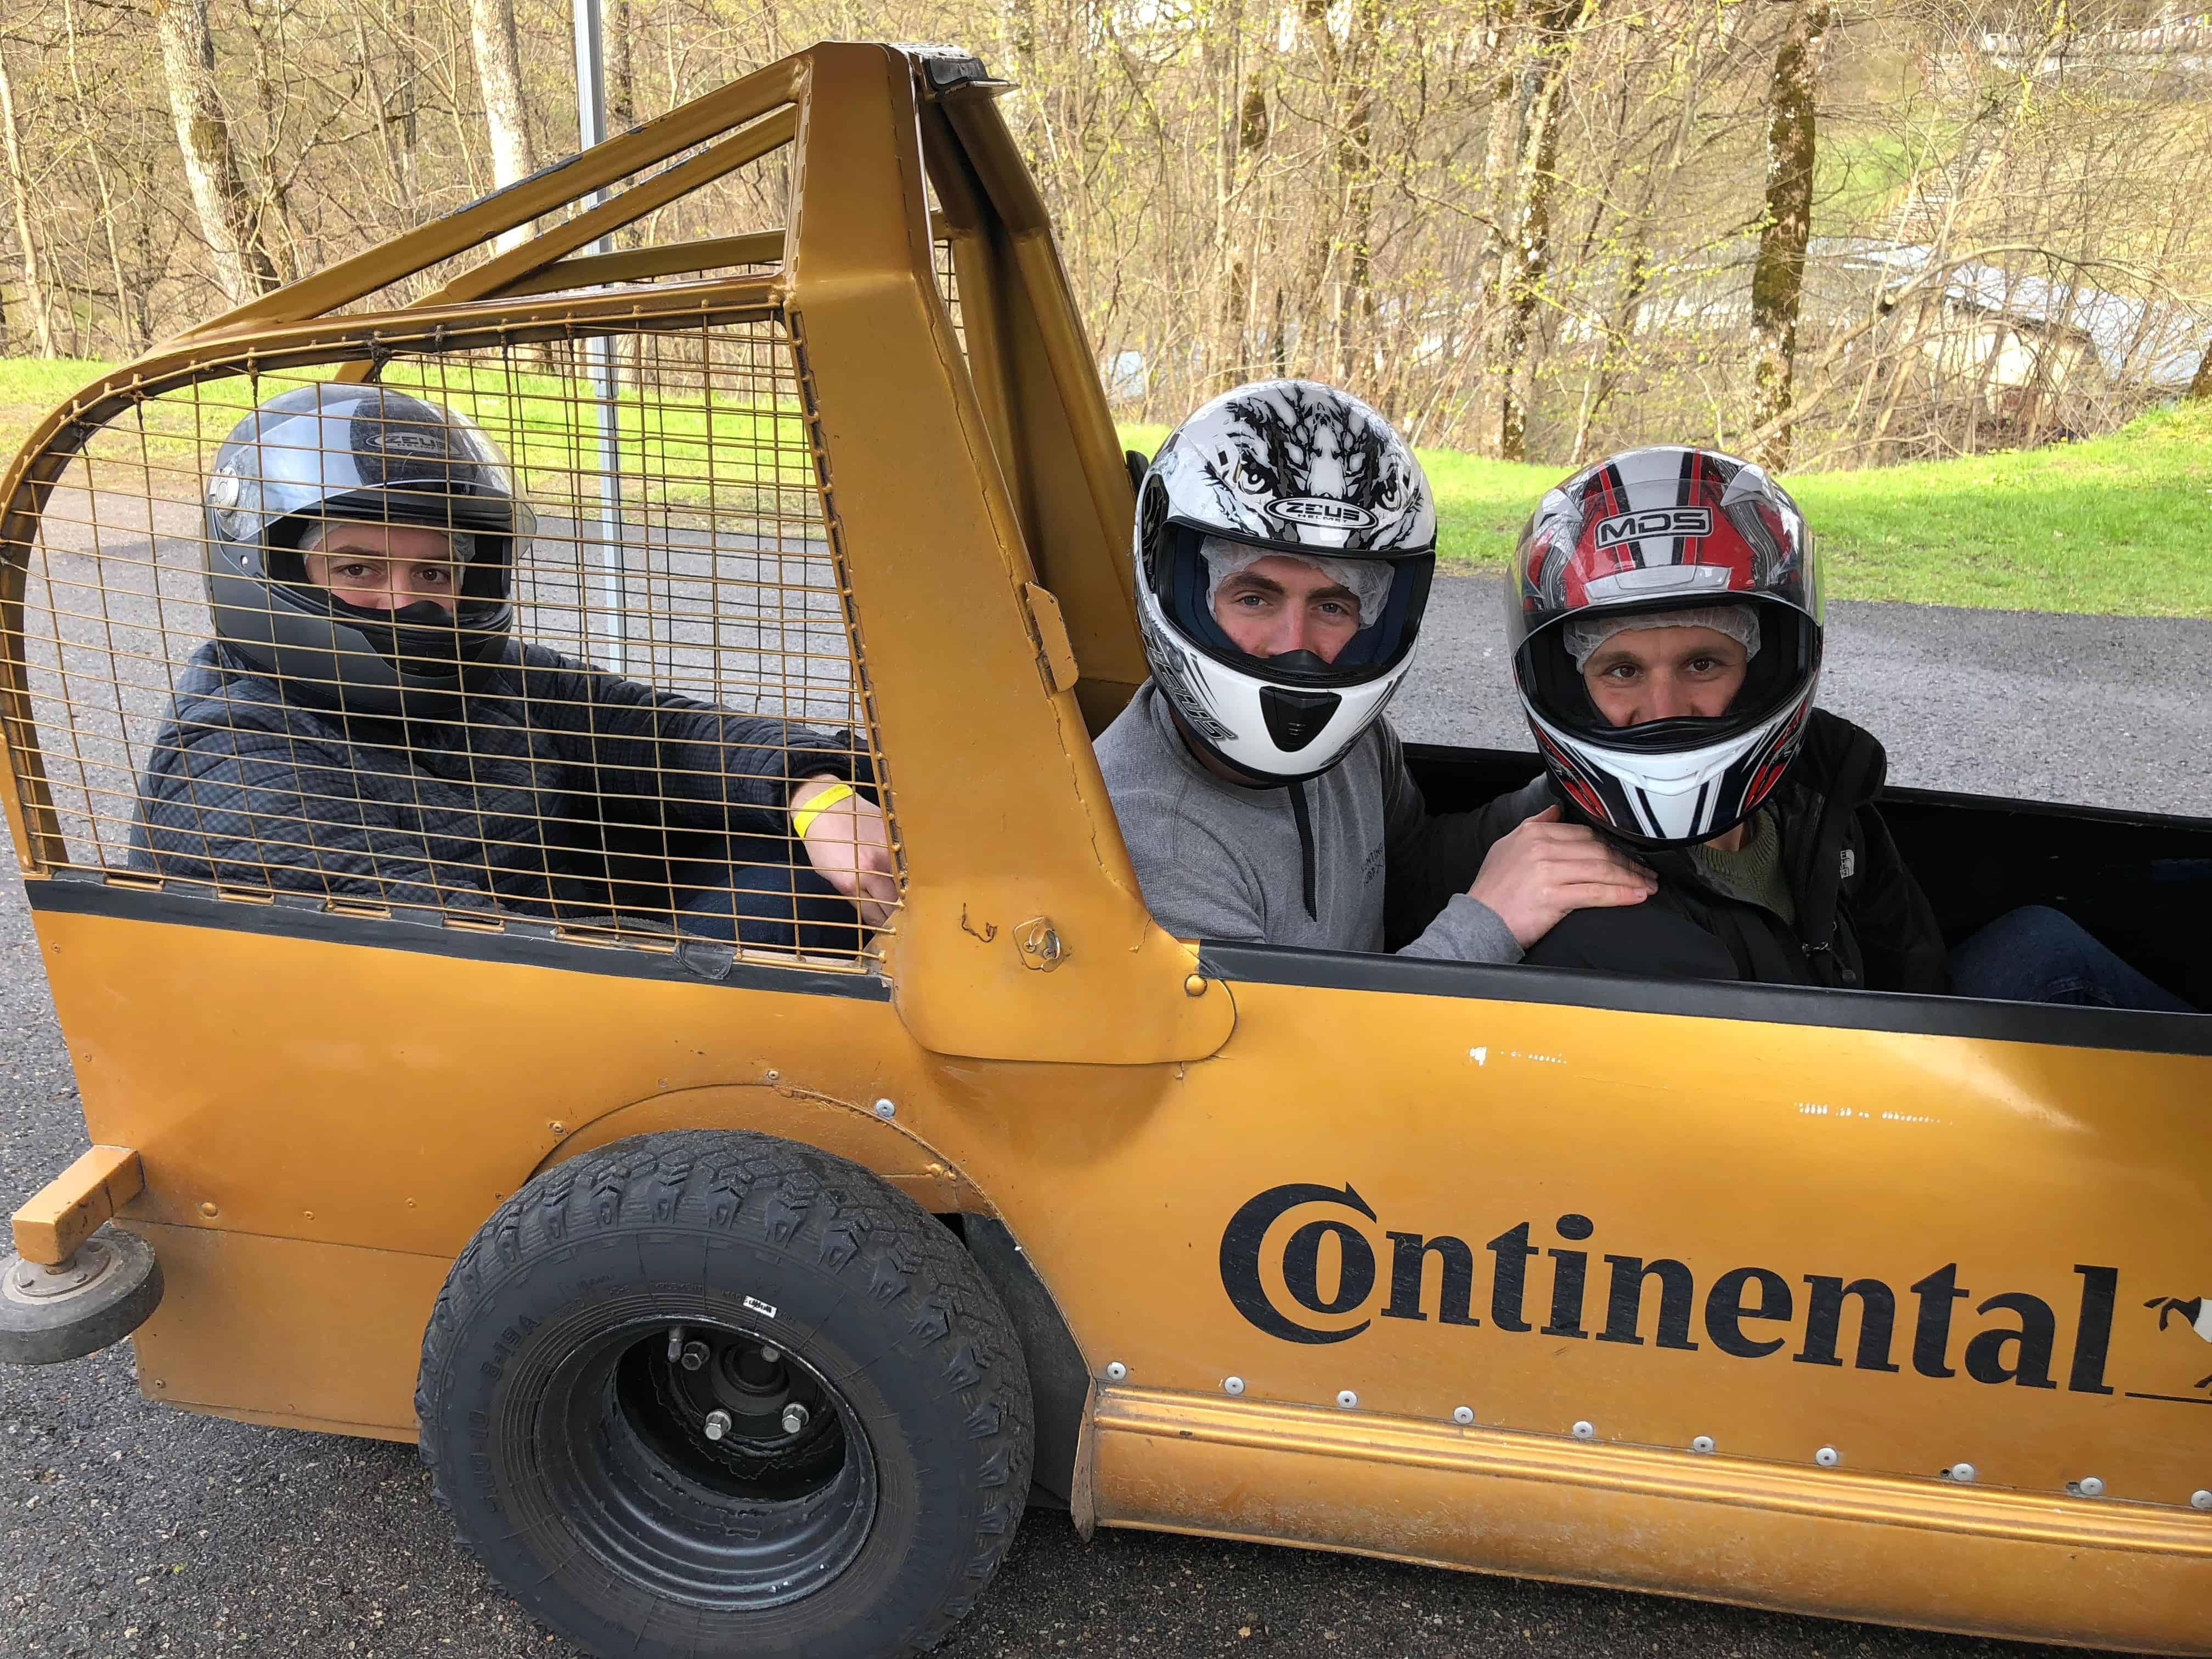 3-men-in-a-bobsleigh-on-wheels